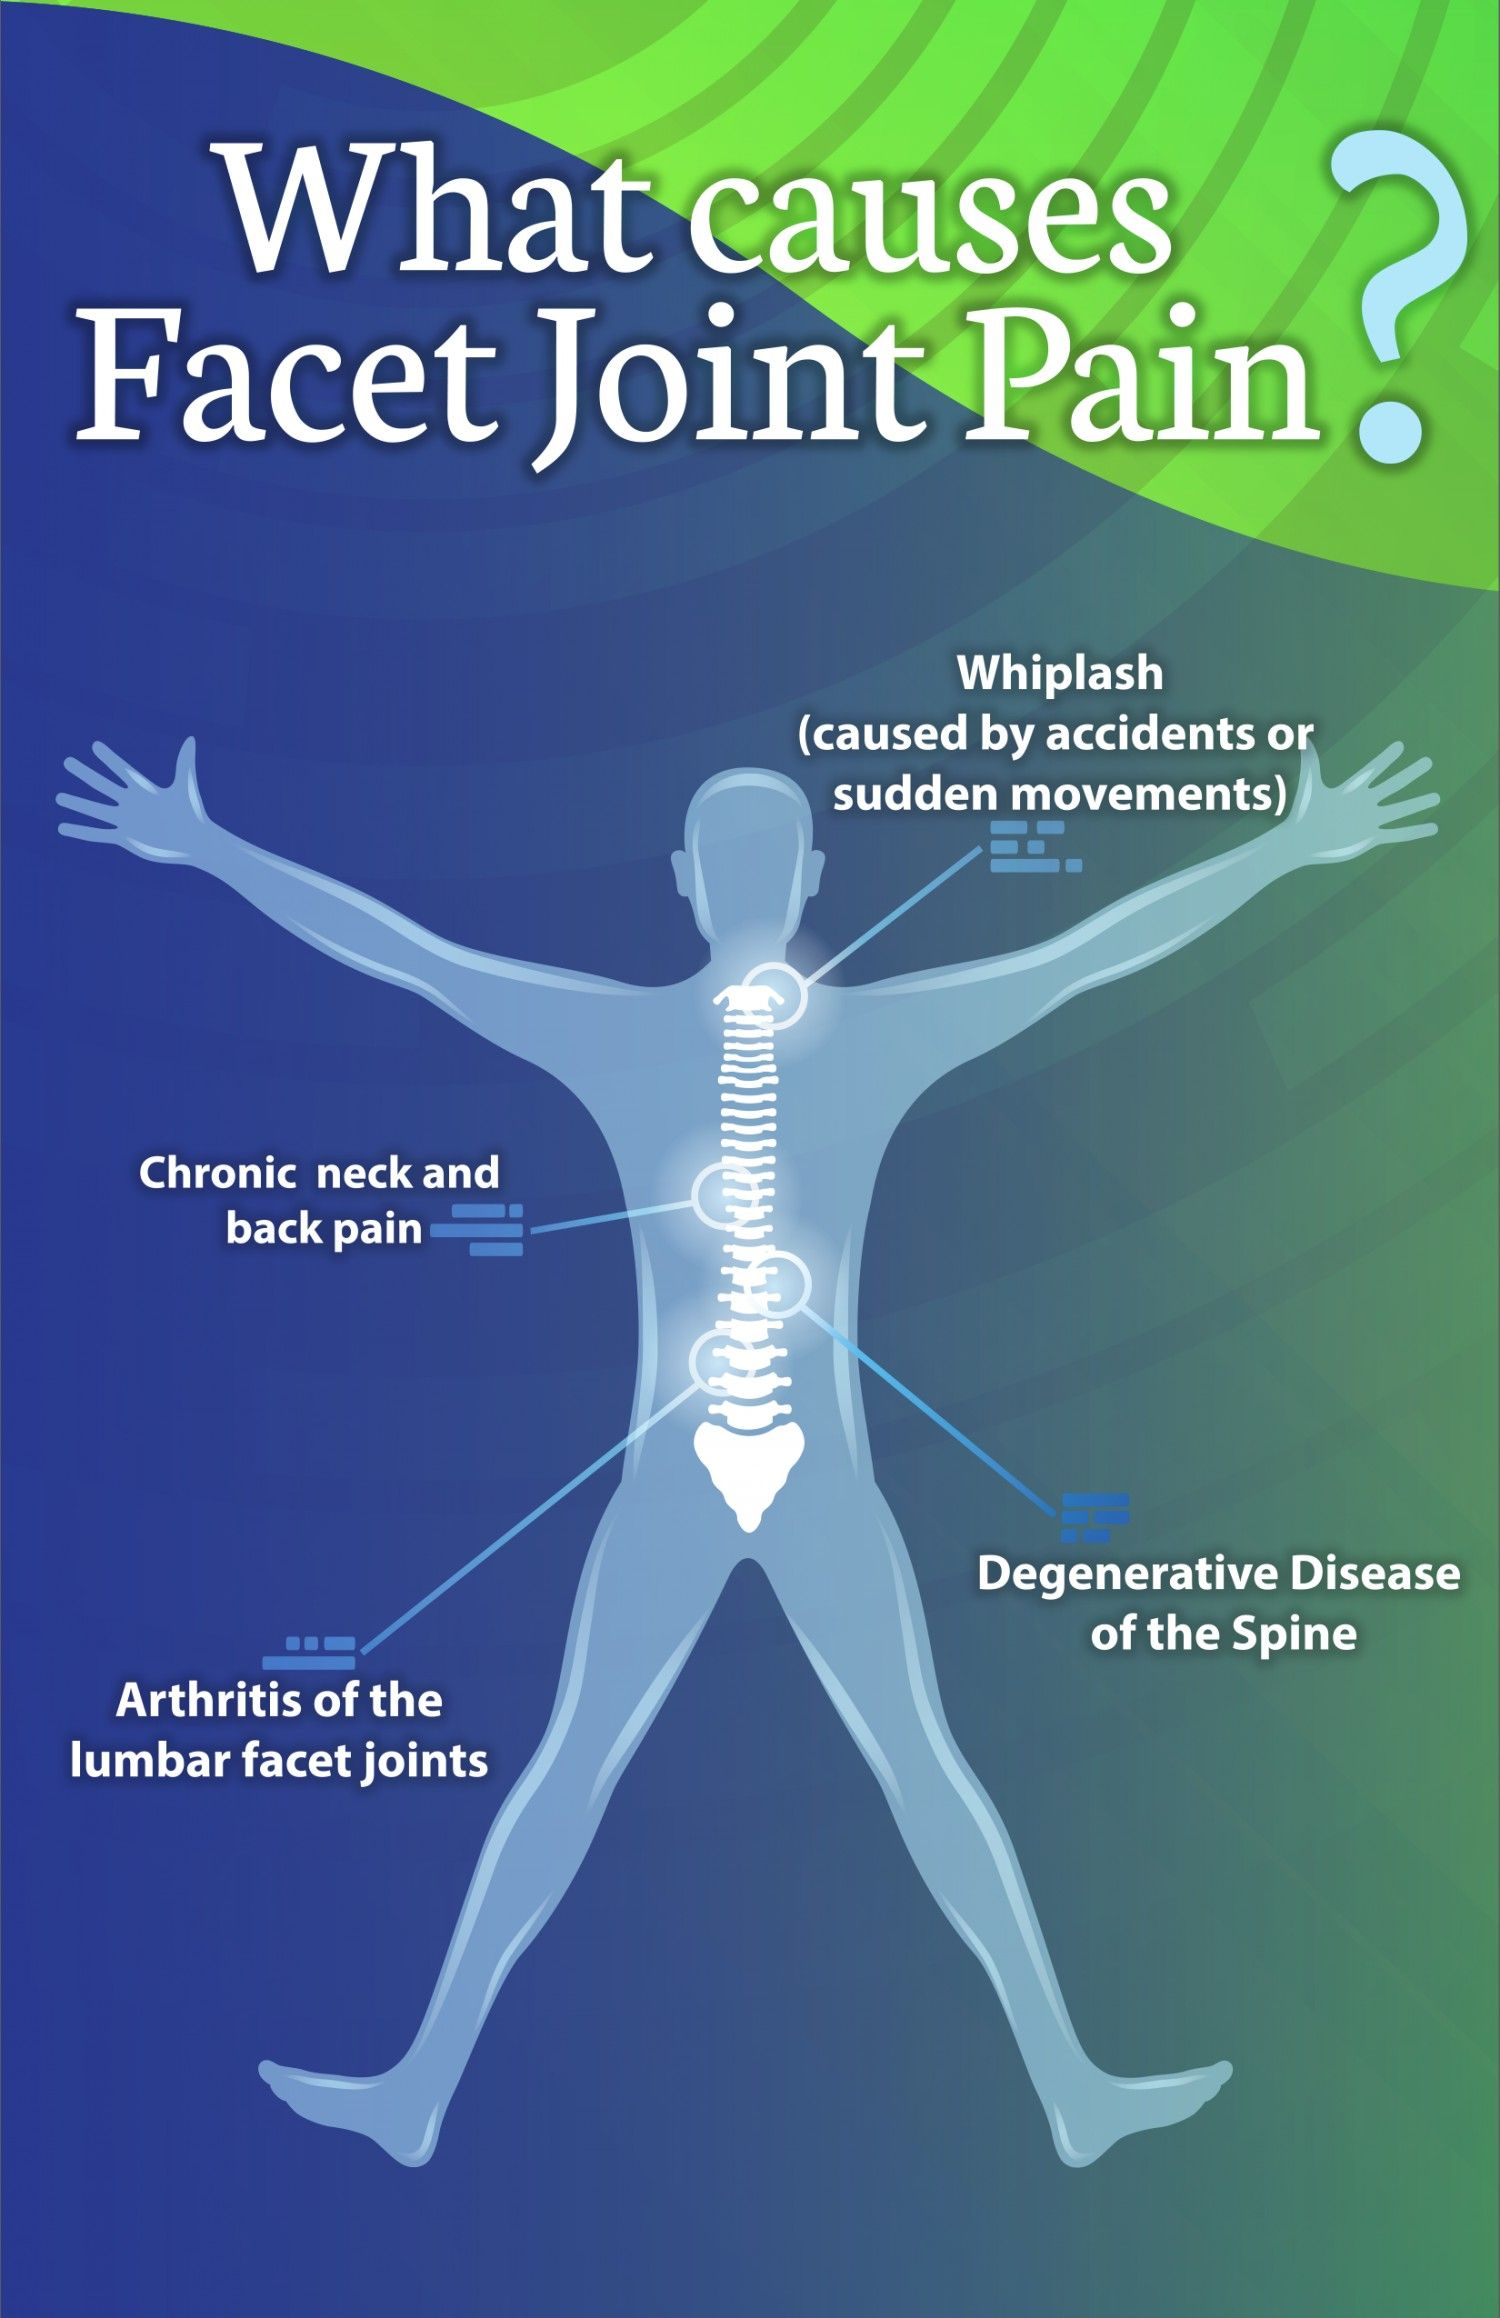 what causes facet joint pain jointpain facetjoint infographic [ 1500 x 2318 Pixel ]